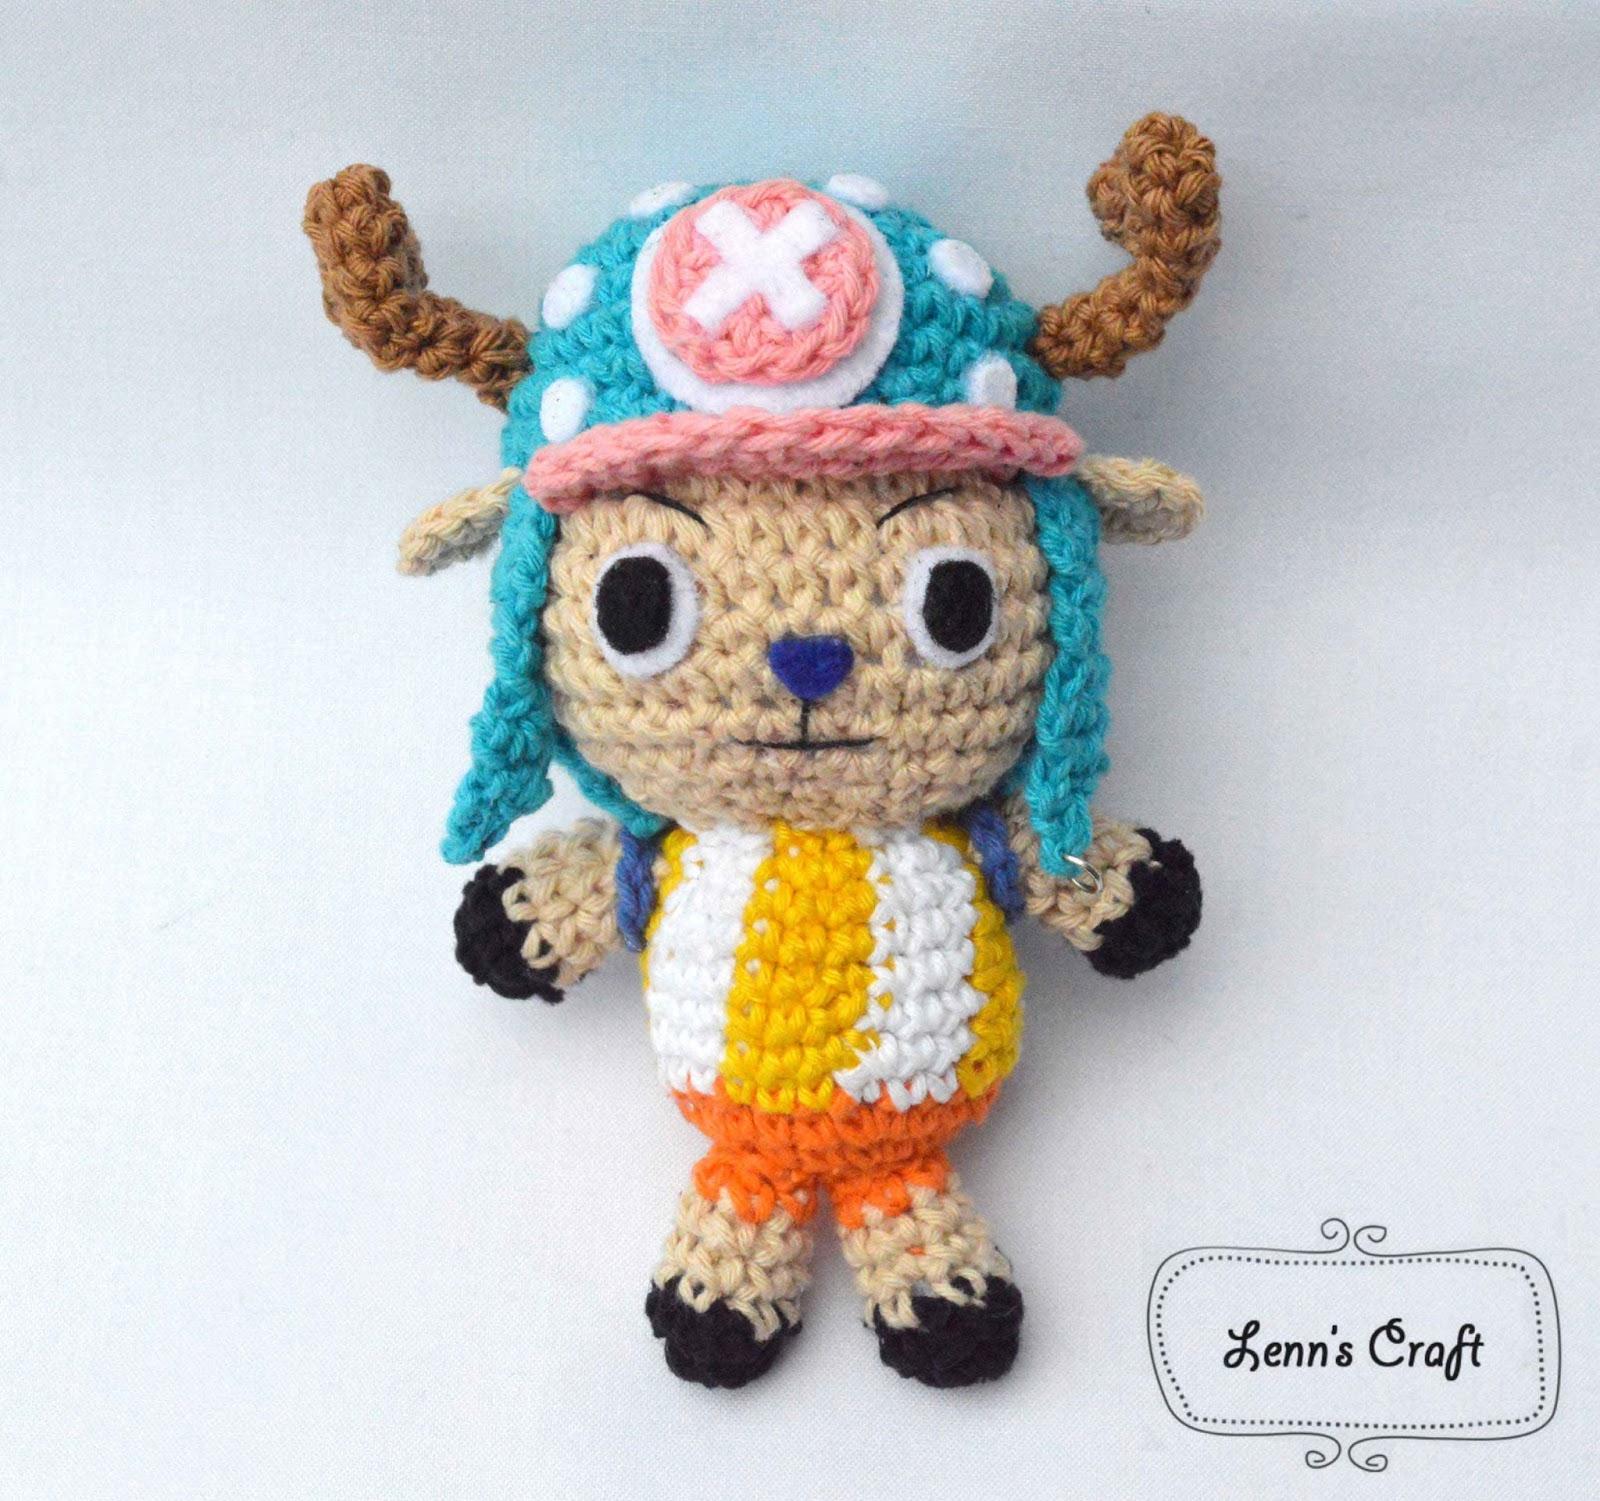 Crochet a Yo-Yo Coverlet | Crochet, Crochet motif, Crochet circles | 1501x1600